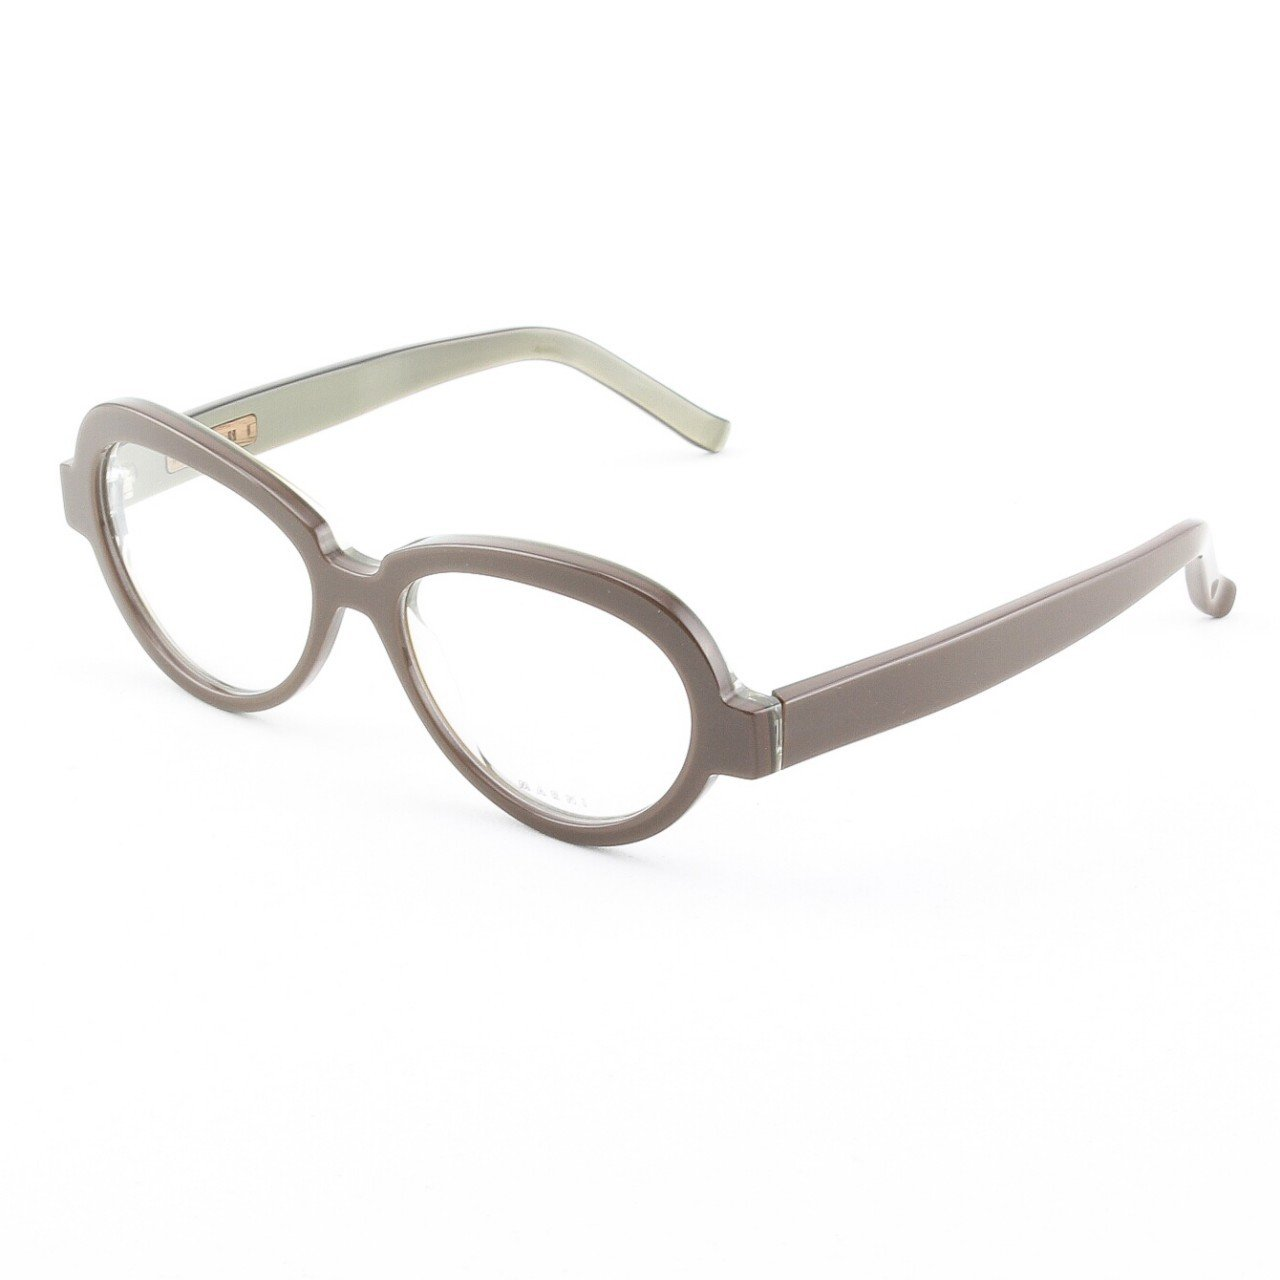 Marni MA645S Eyeglasses Col. 20 Mocha High Gloss Frame with Clear Lenses